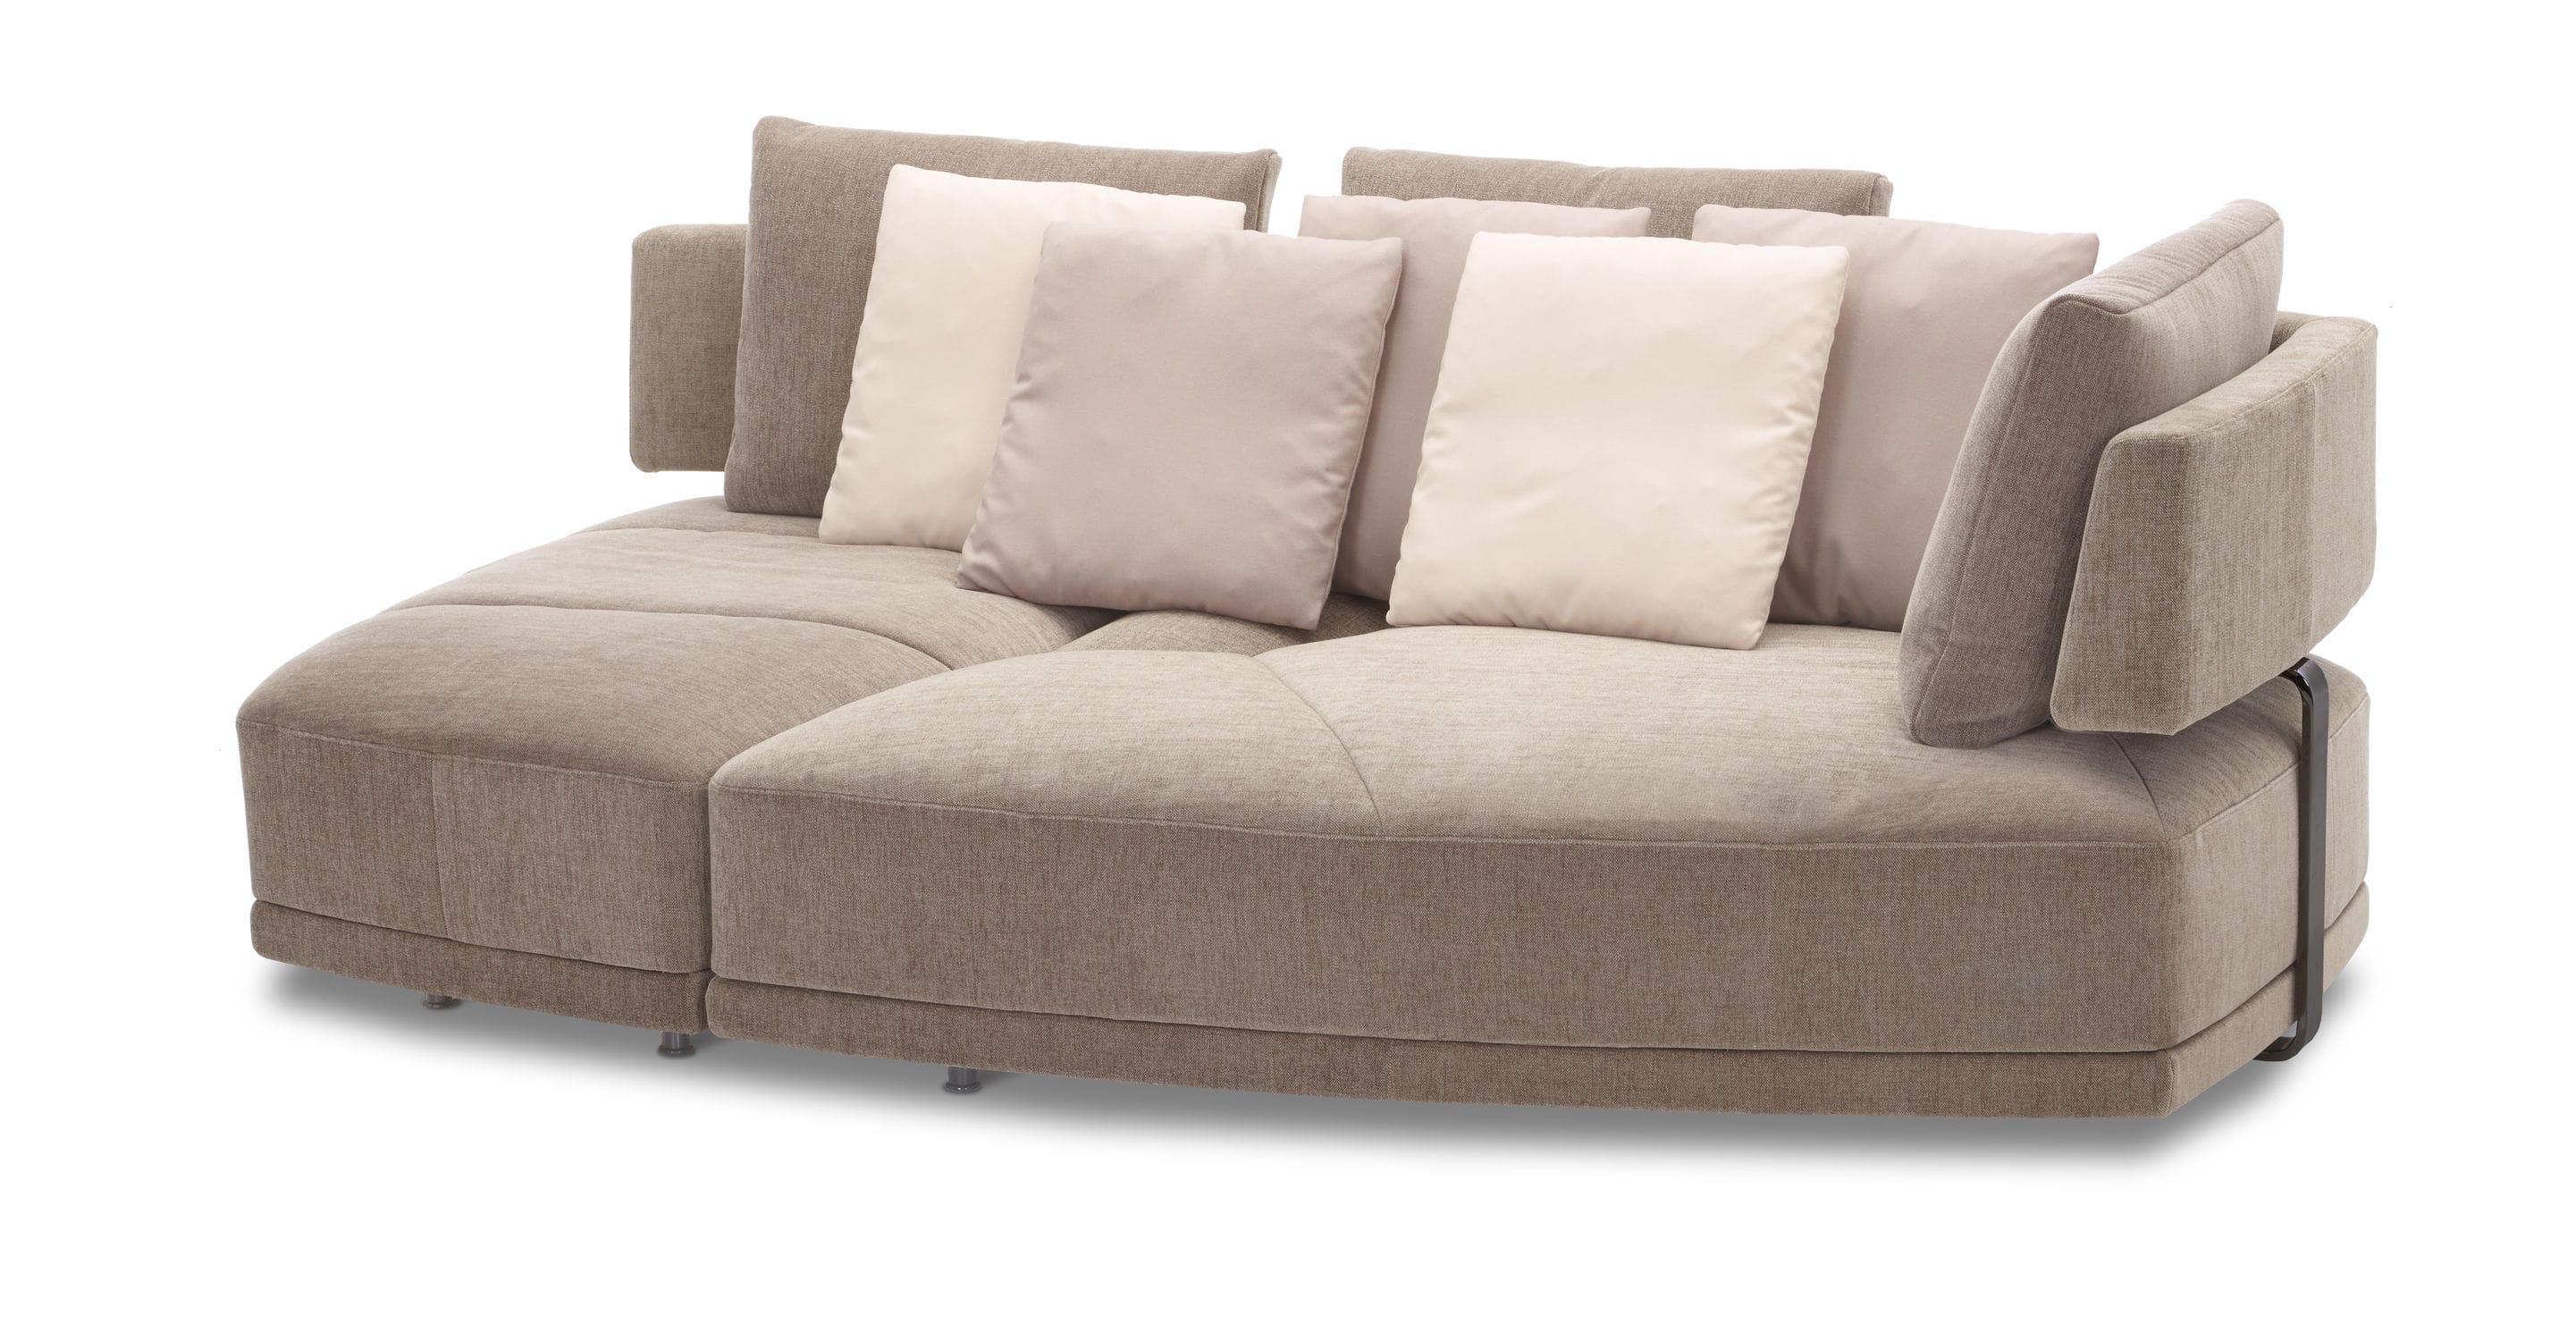 Modular sofa contemporary leather fabric WING DIVAN BASE